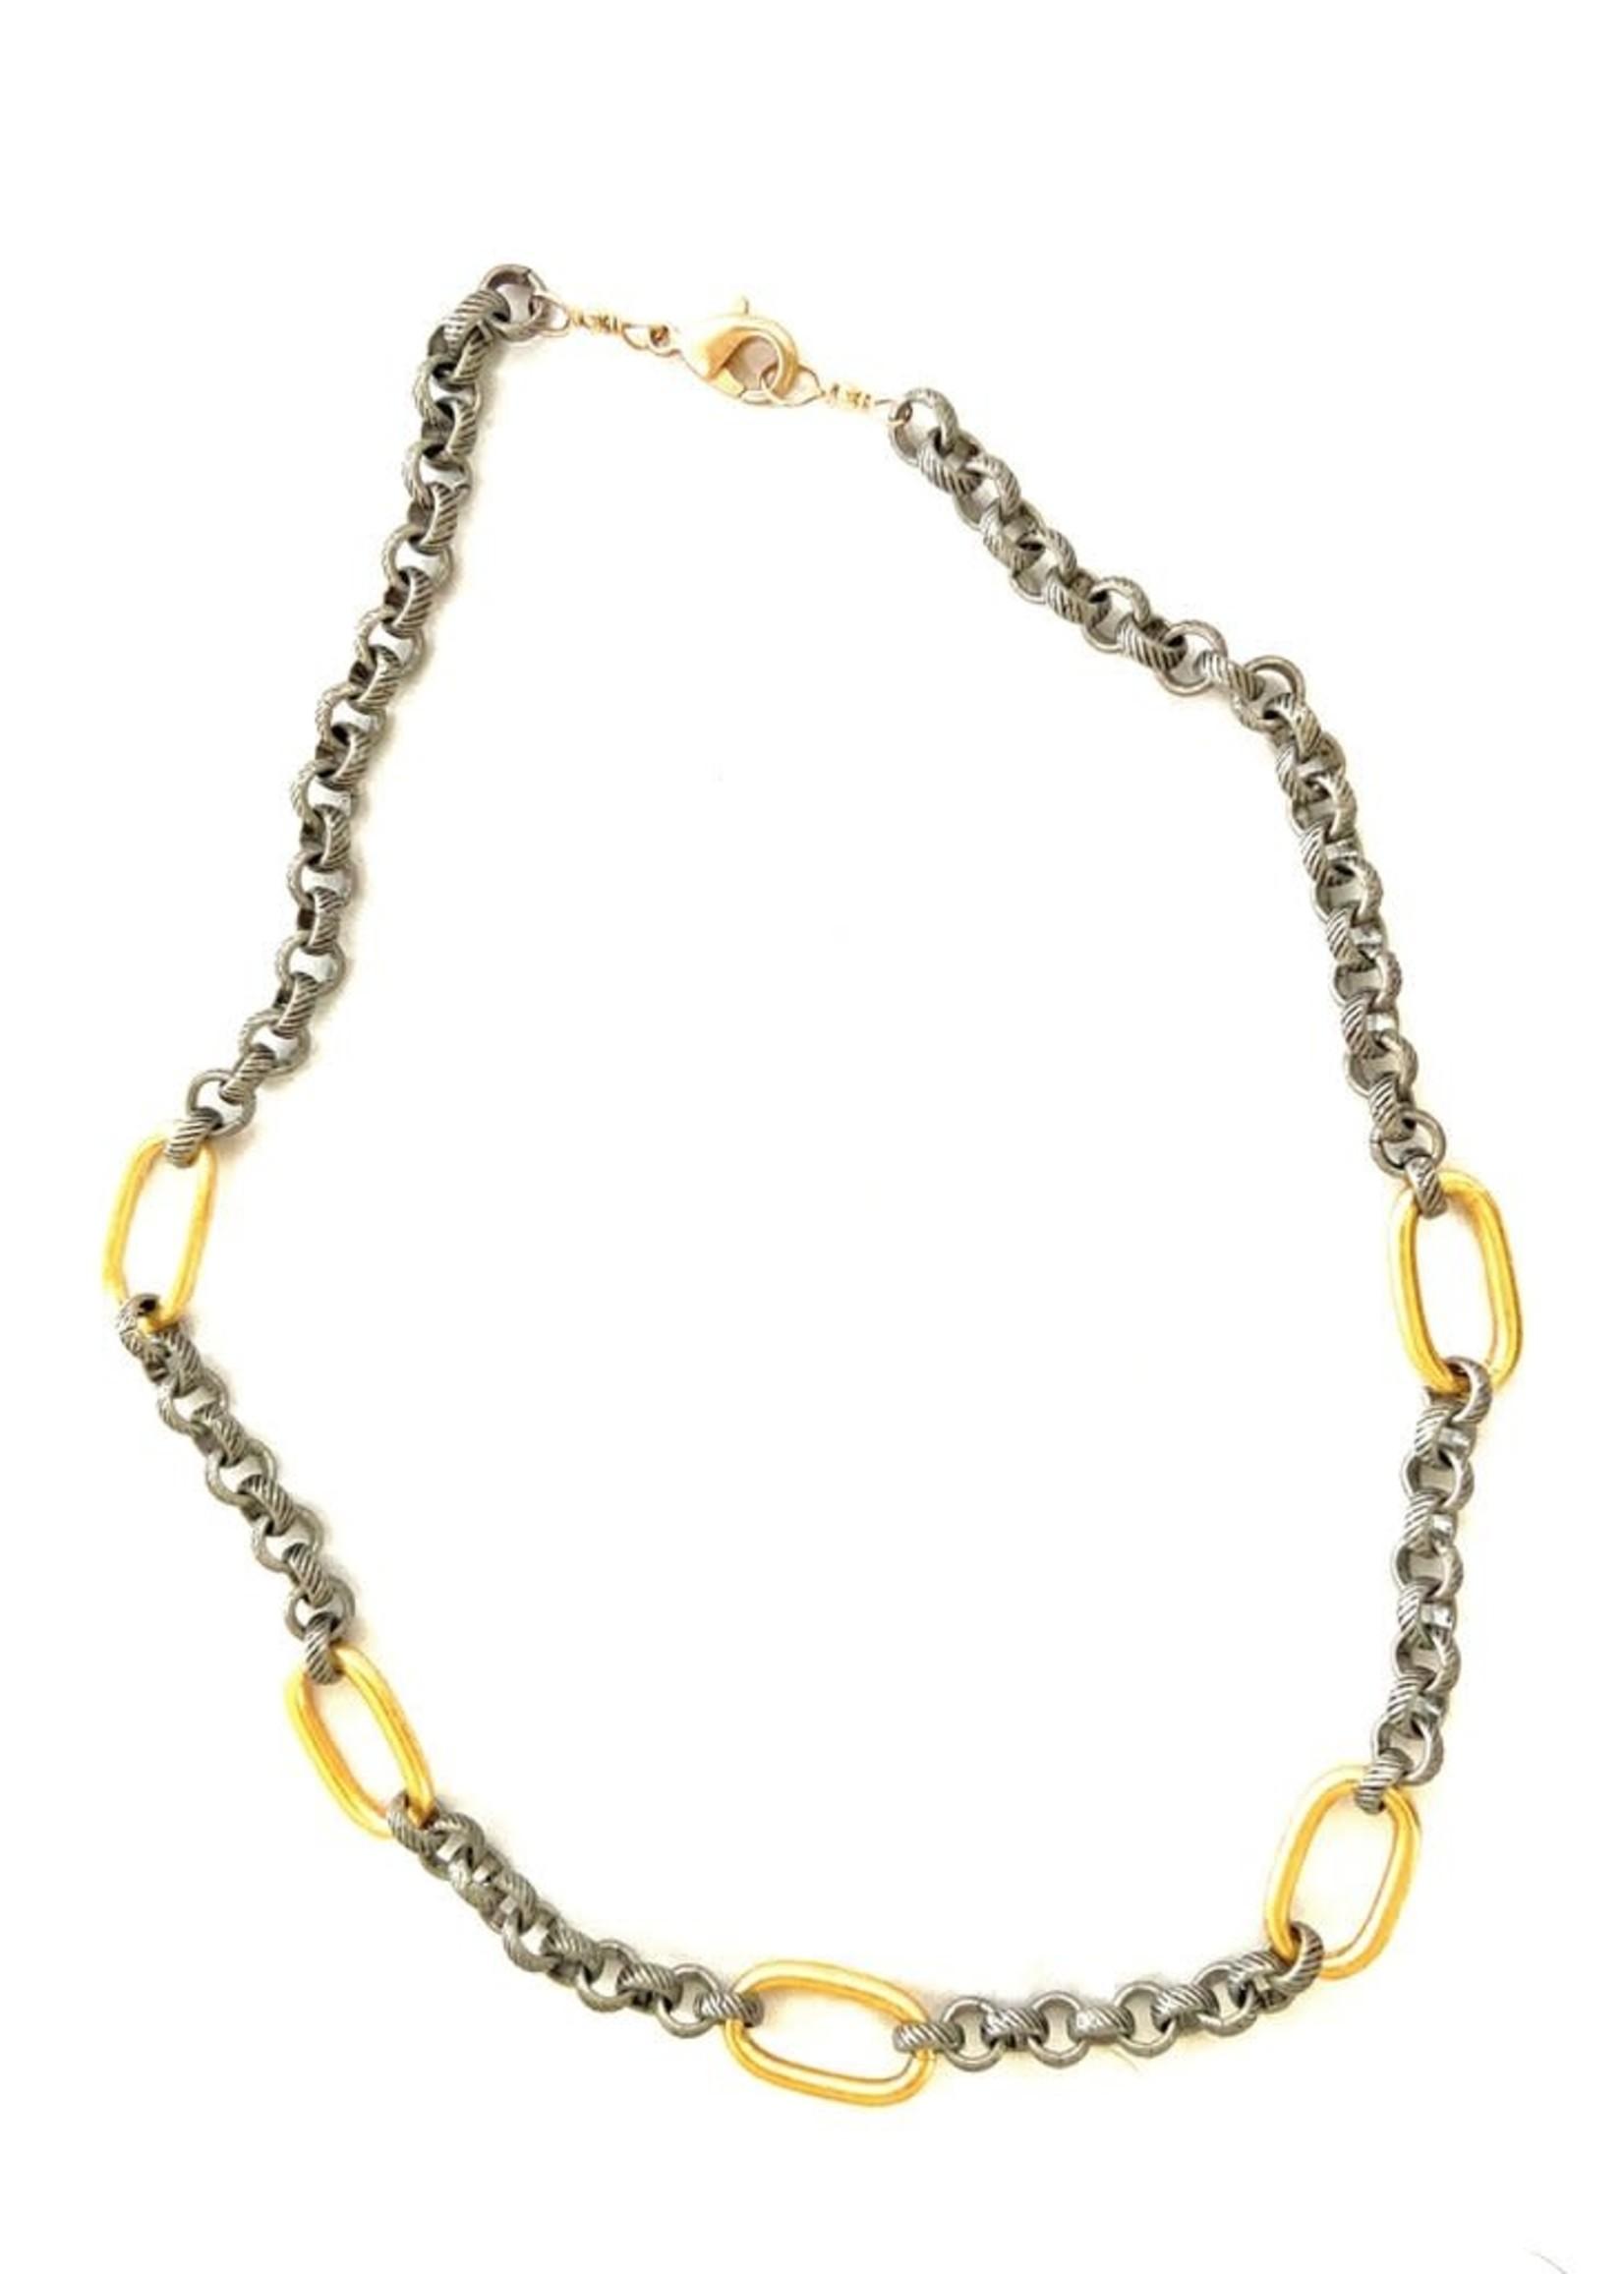 CV Designs Mixed metals necklace